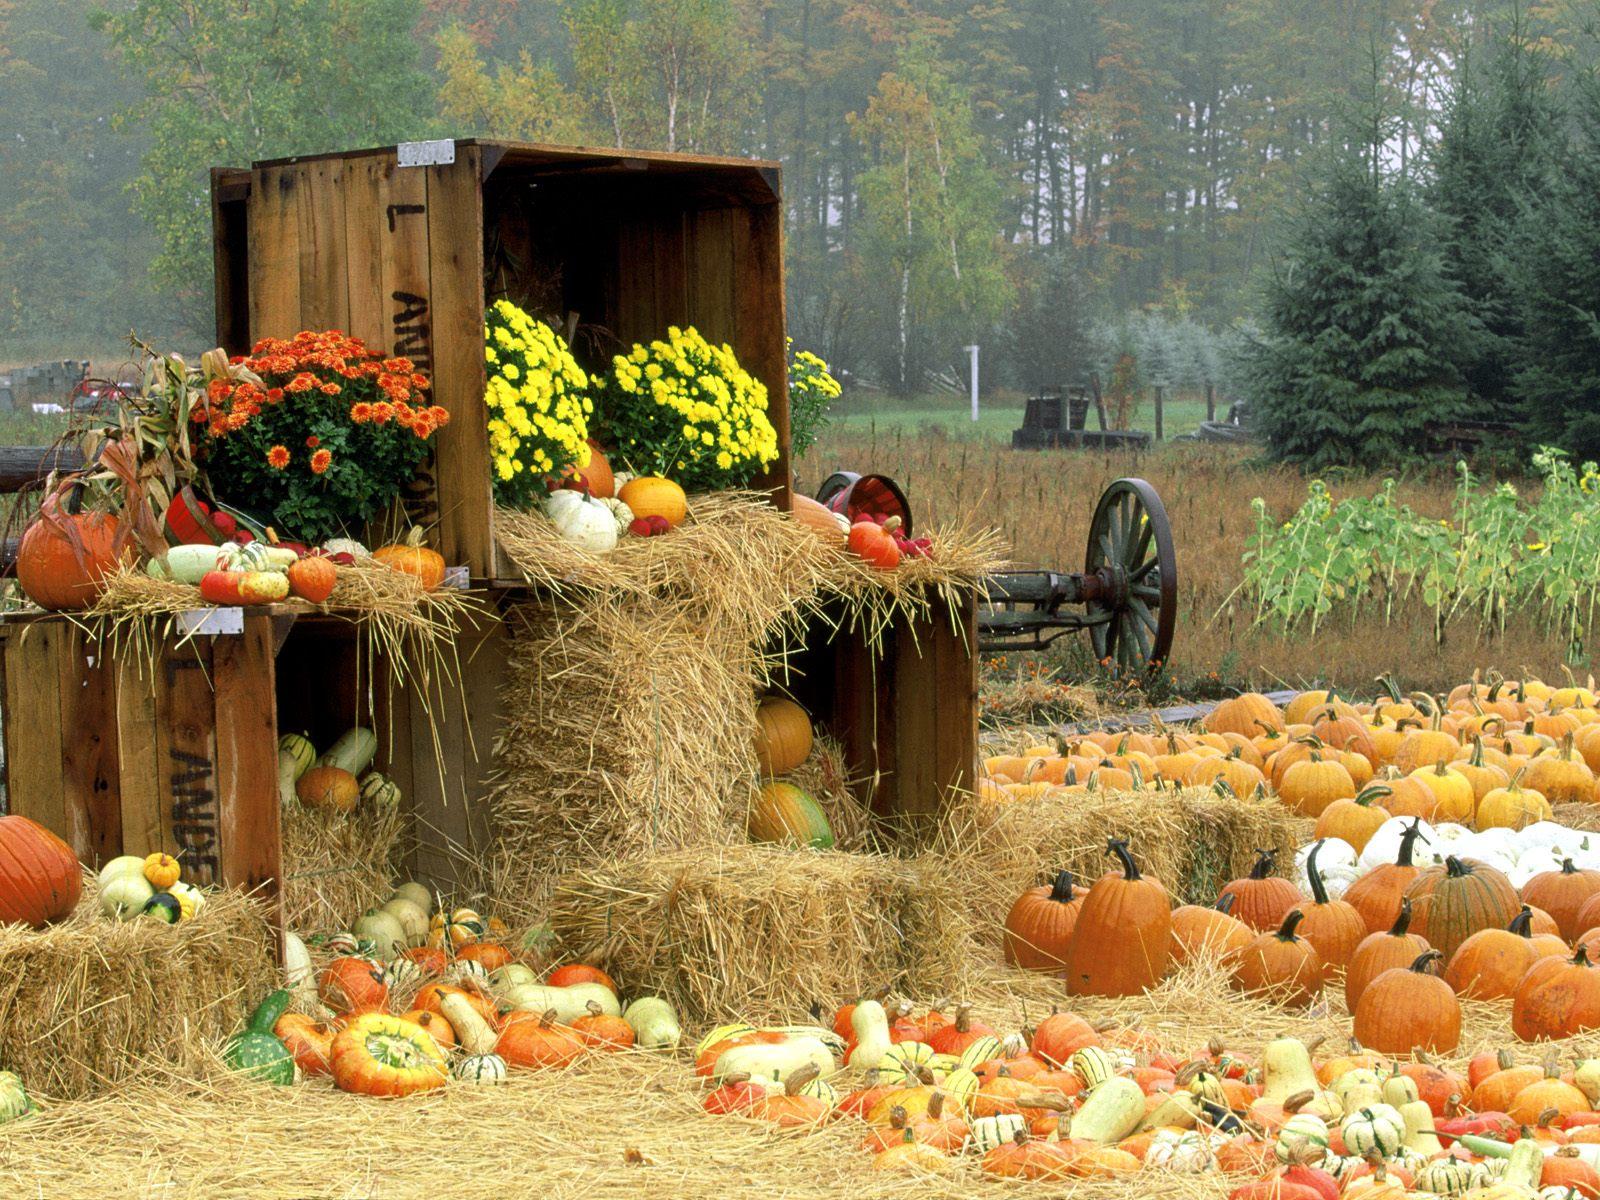 Autumn Autumn Roadside Manistee County Onekama Michigan 1600x1200